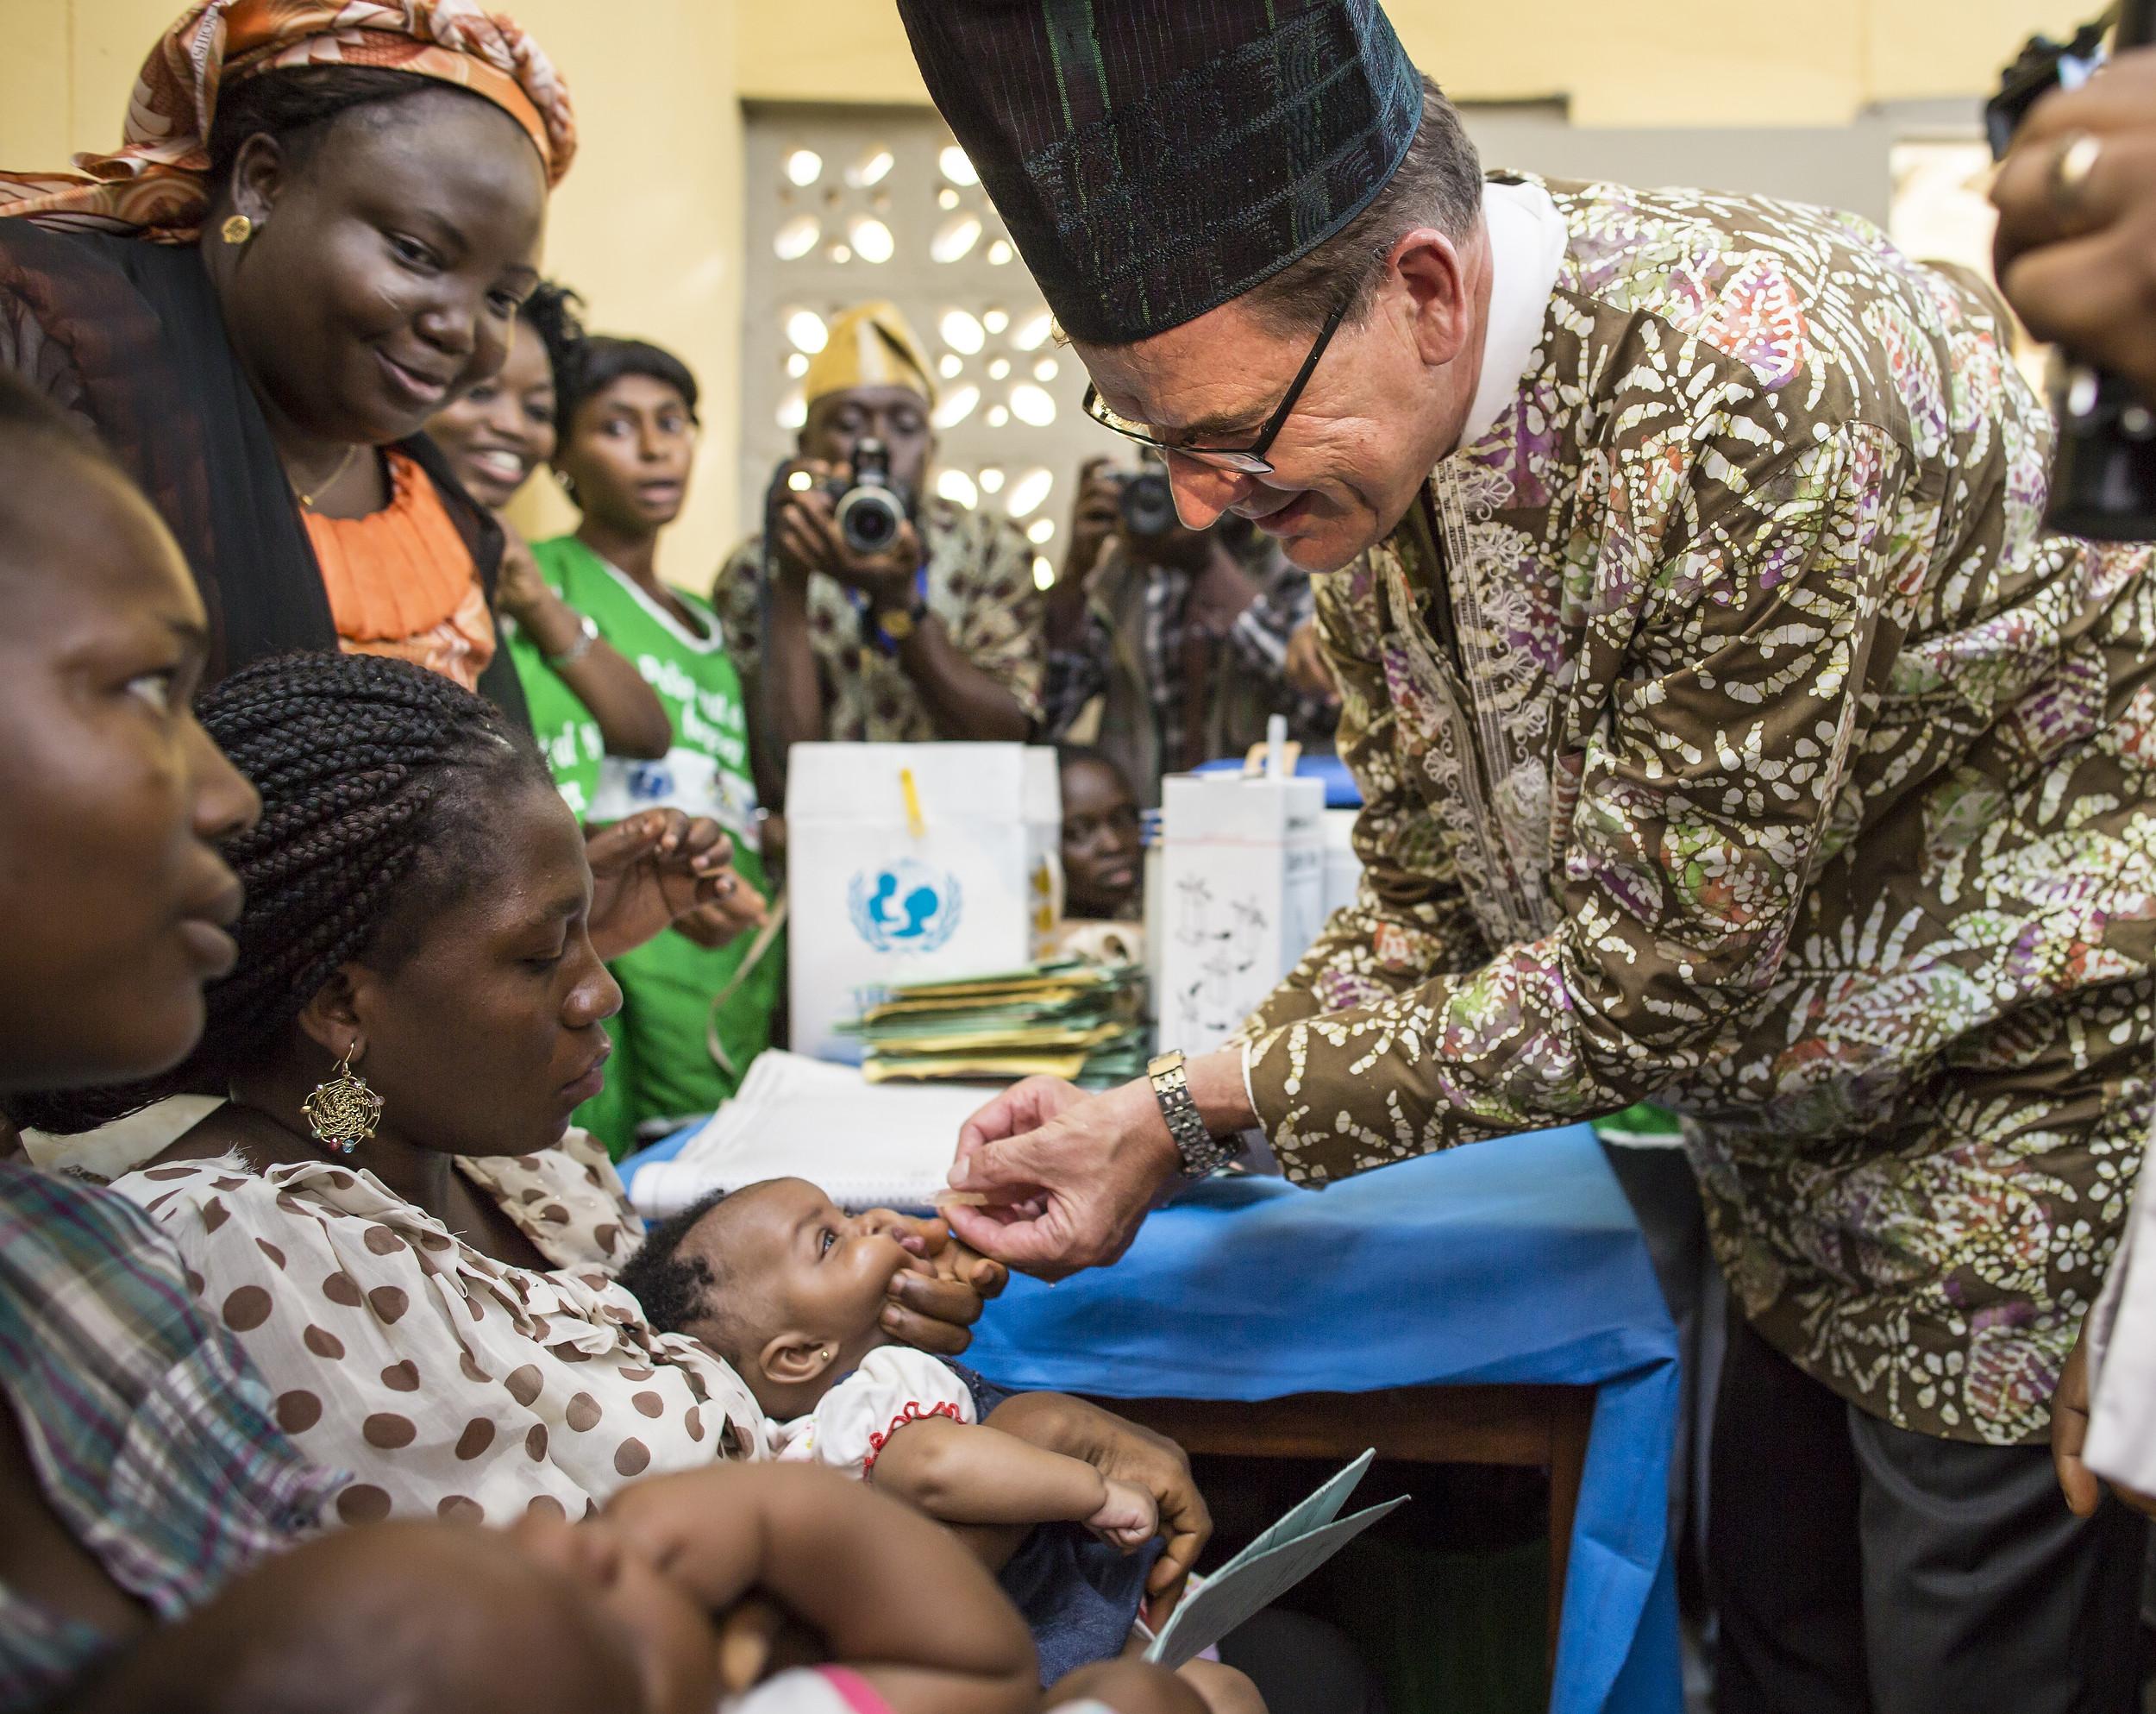 German Development Minister Gerd Mueller vaccinates a child against polio in a hospital on June 11, 2014 in Abeokuta, Nigeria.